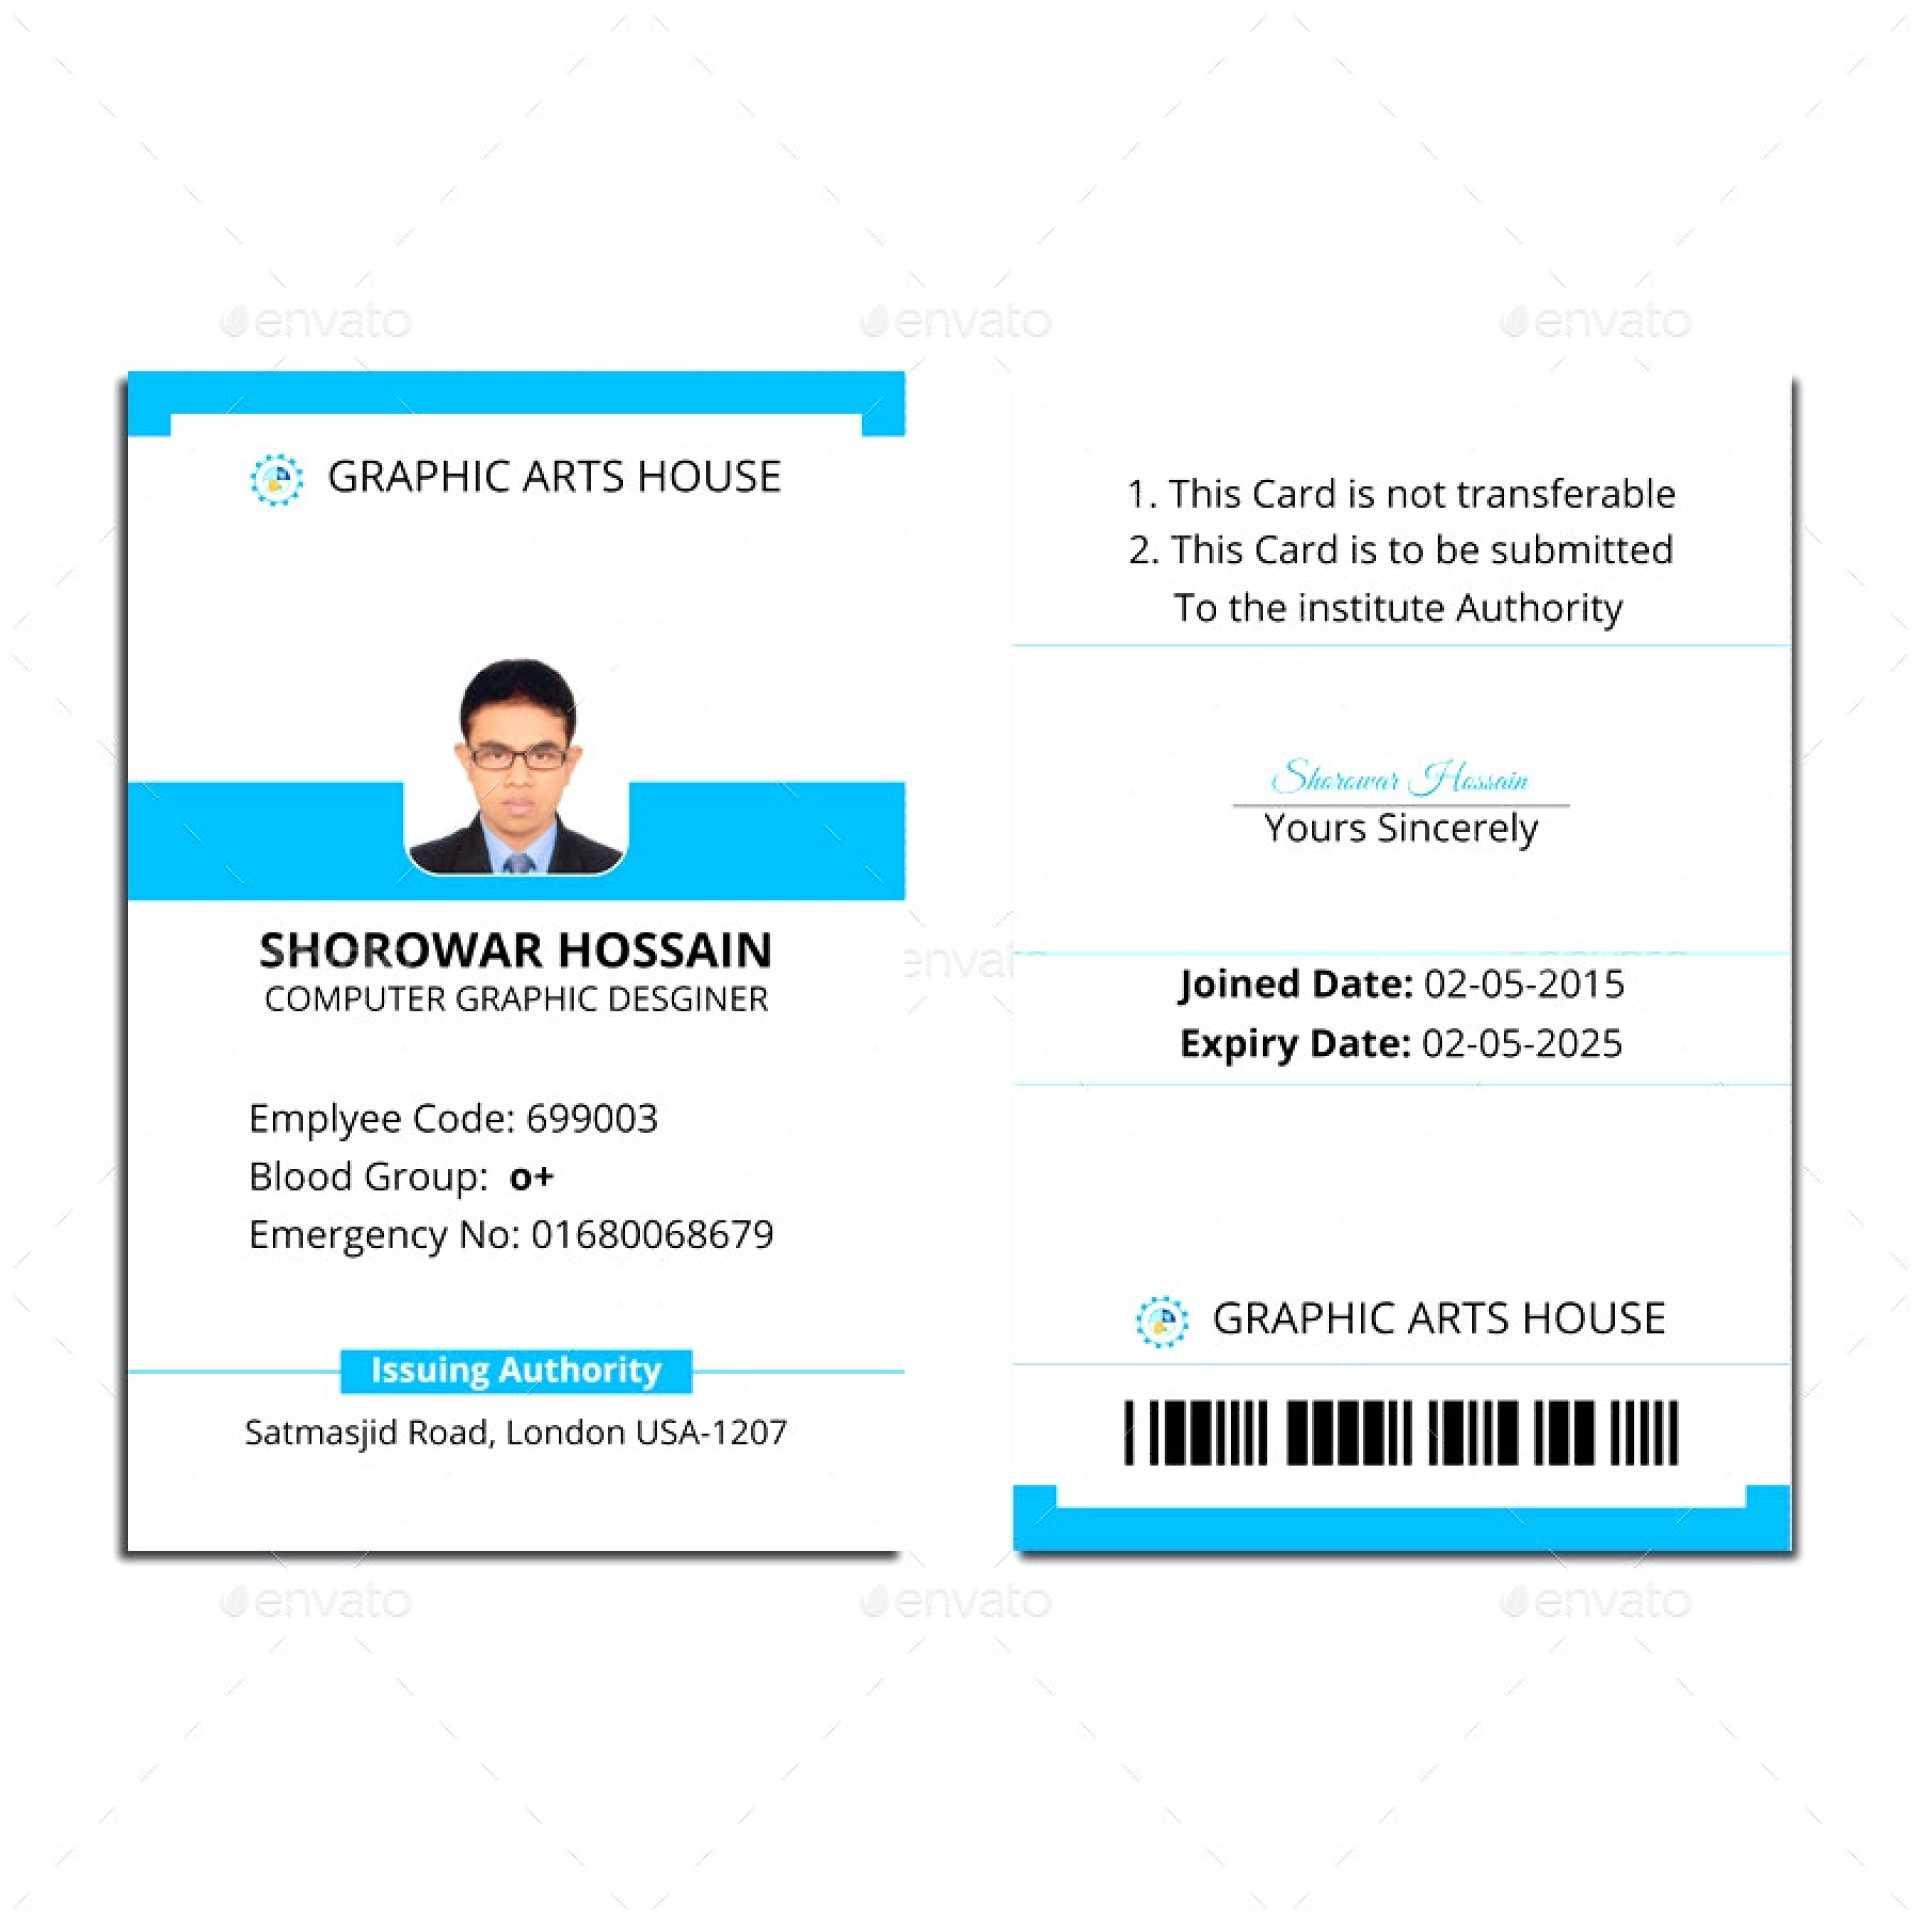 006 Id Card Template Word Ideas 1920X1920 Employee Microsoft Within Employee Card Template Word